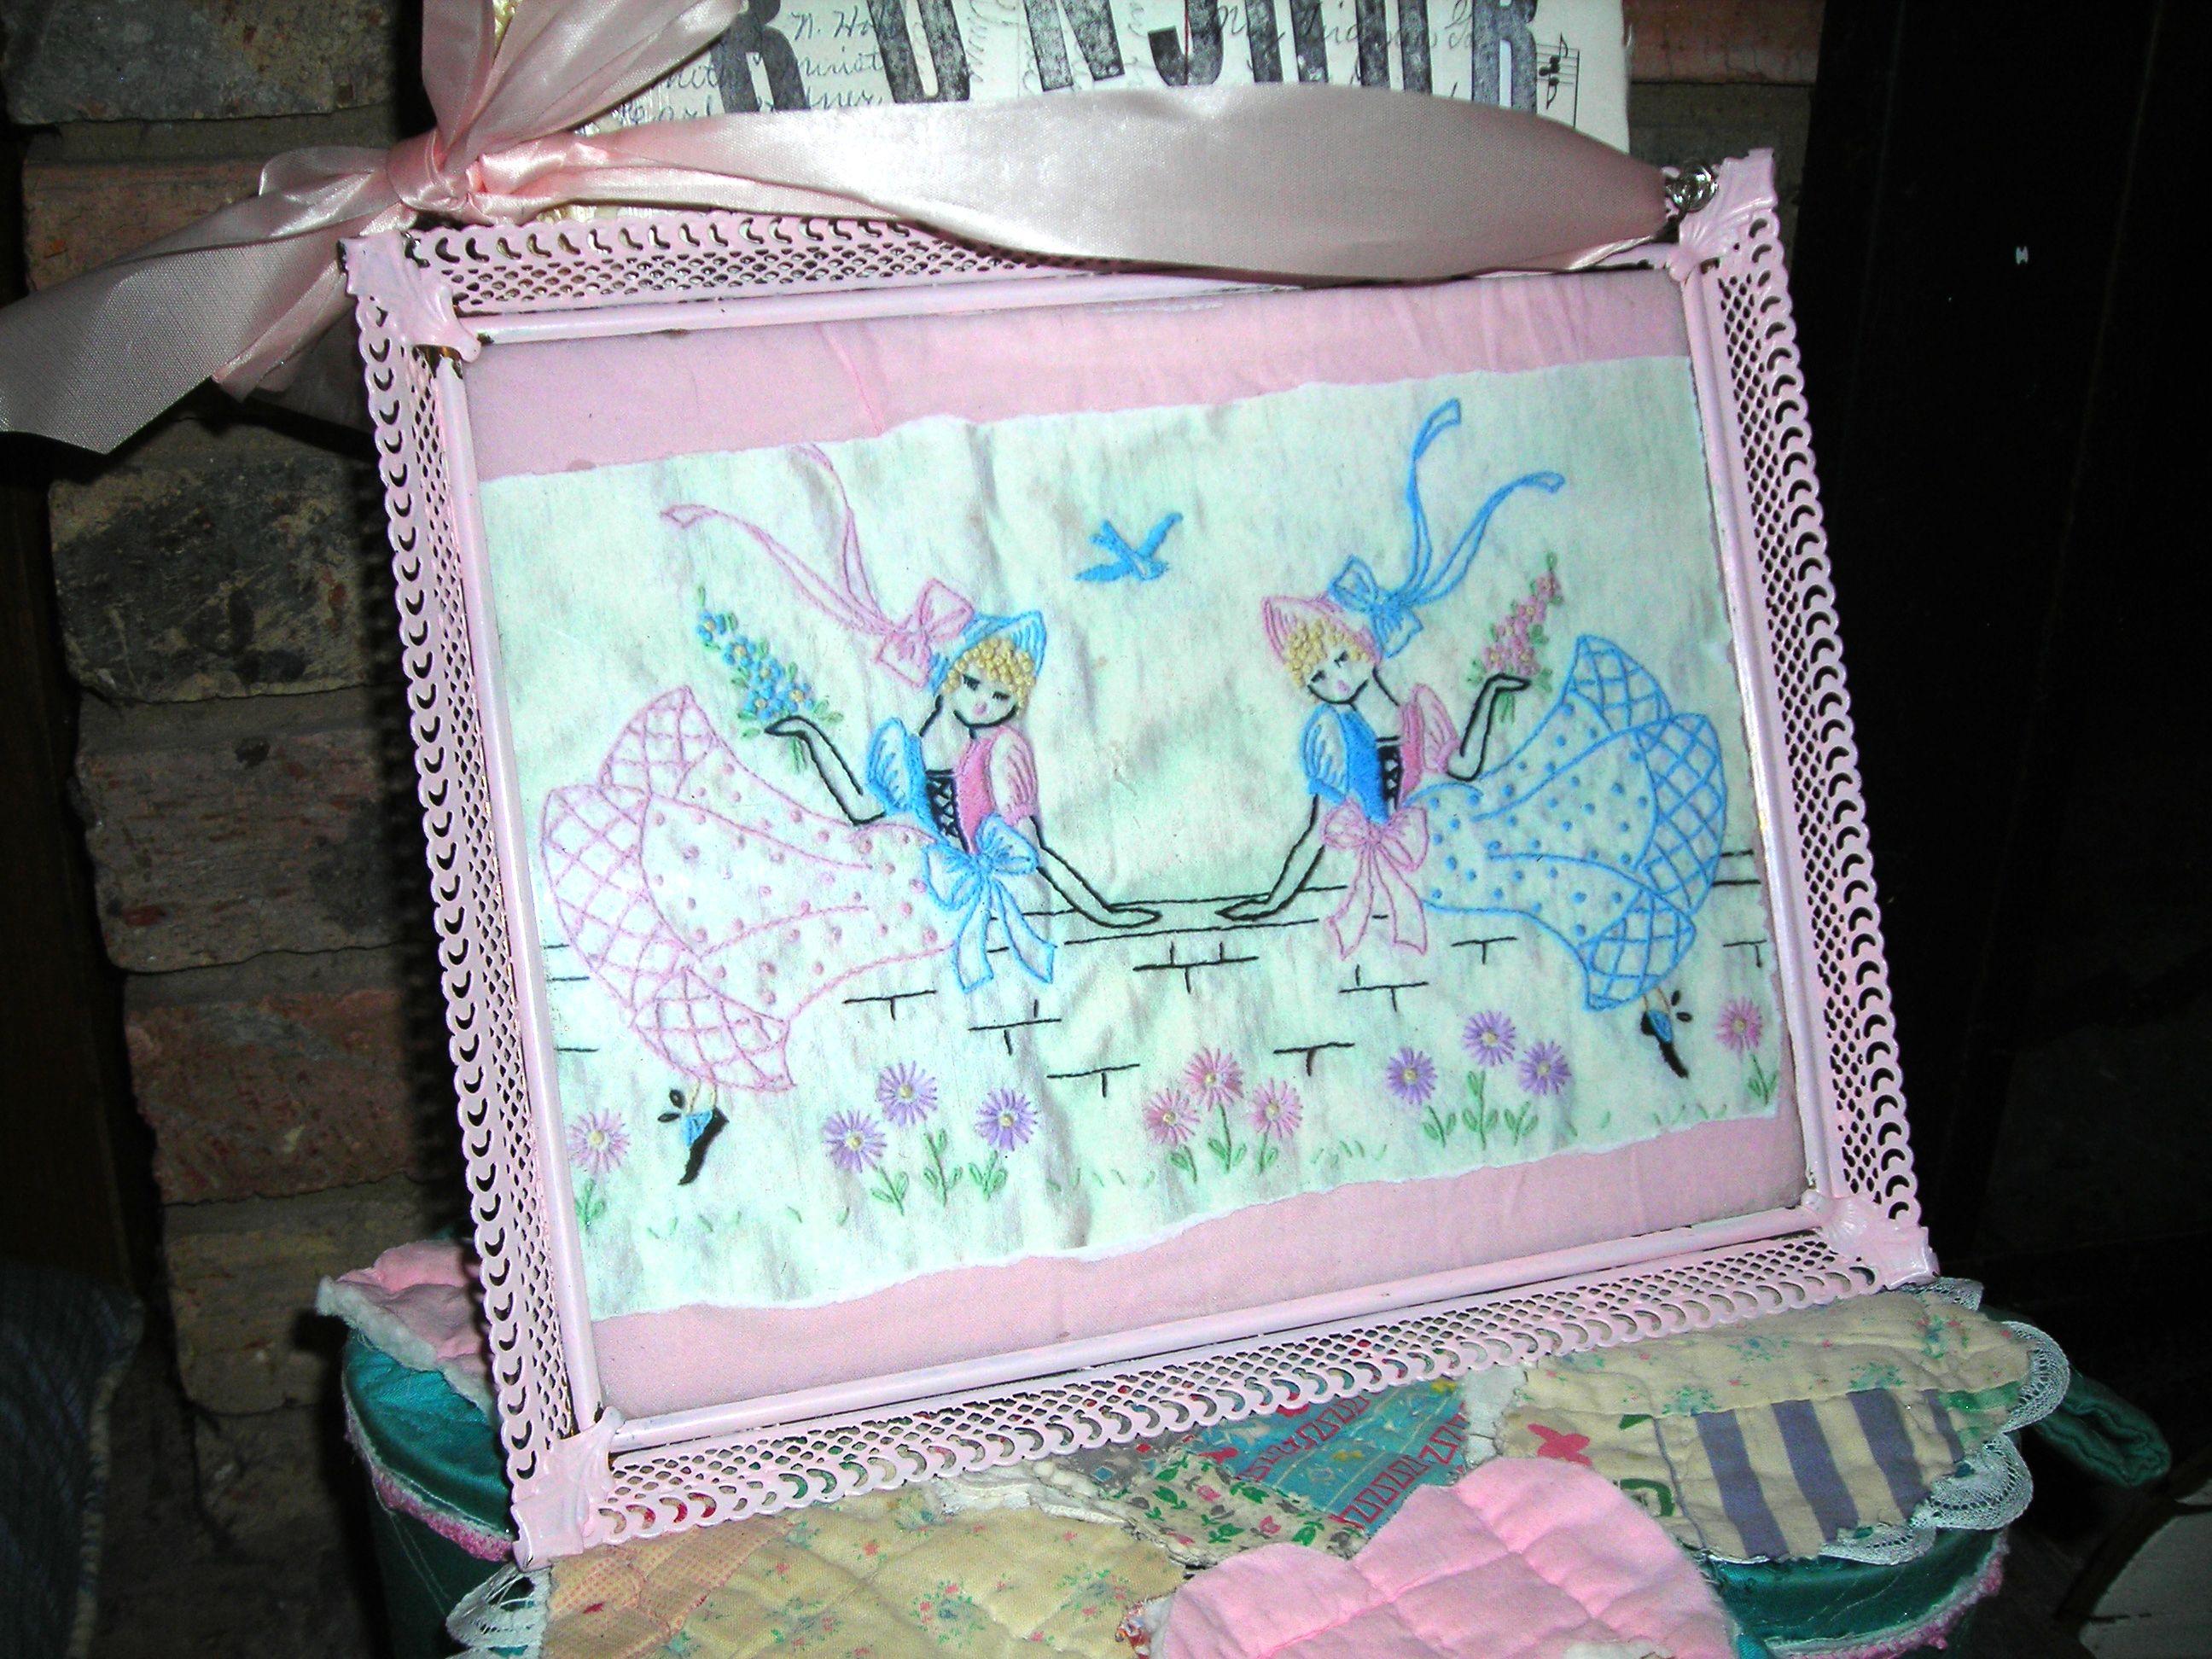 sweet ladies in a frame